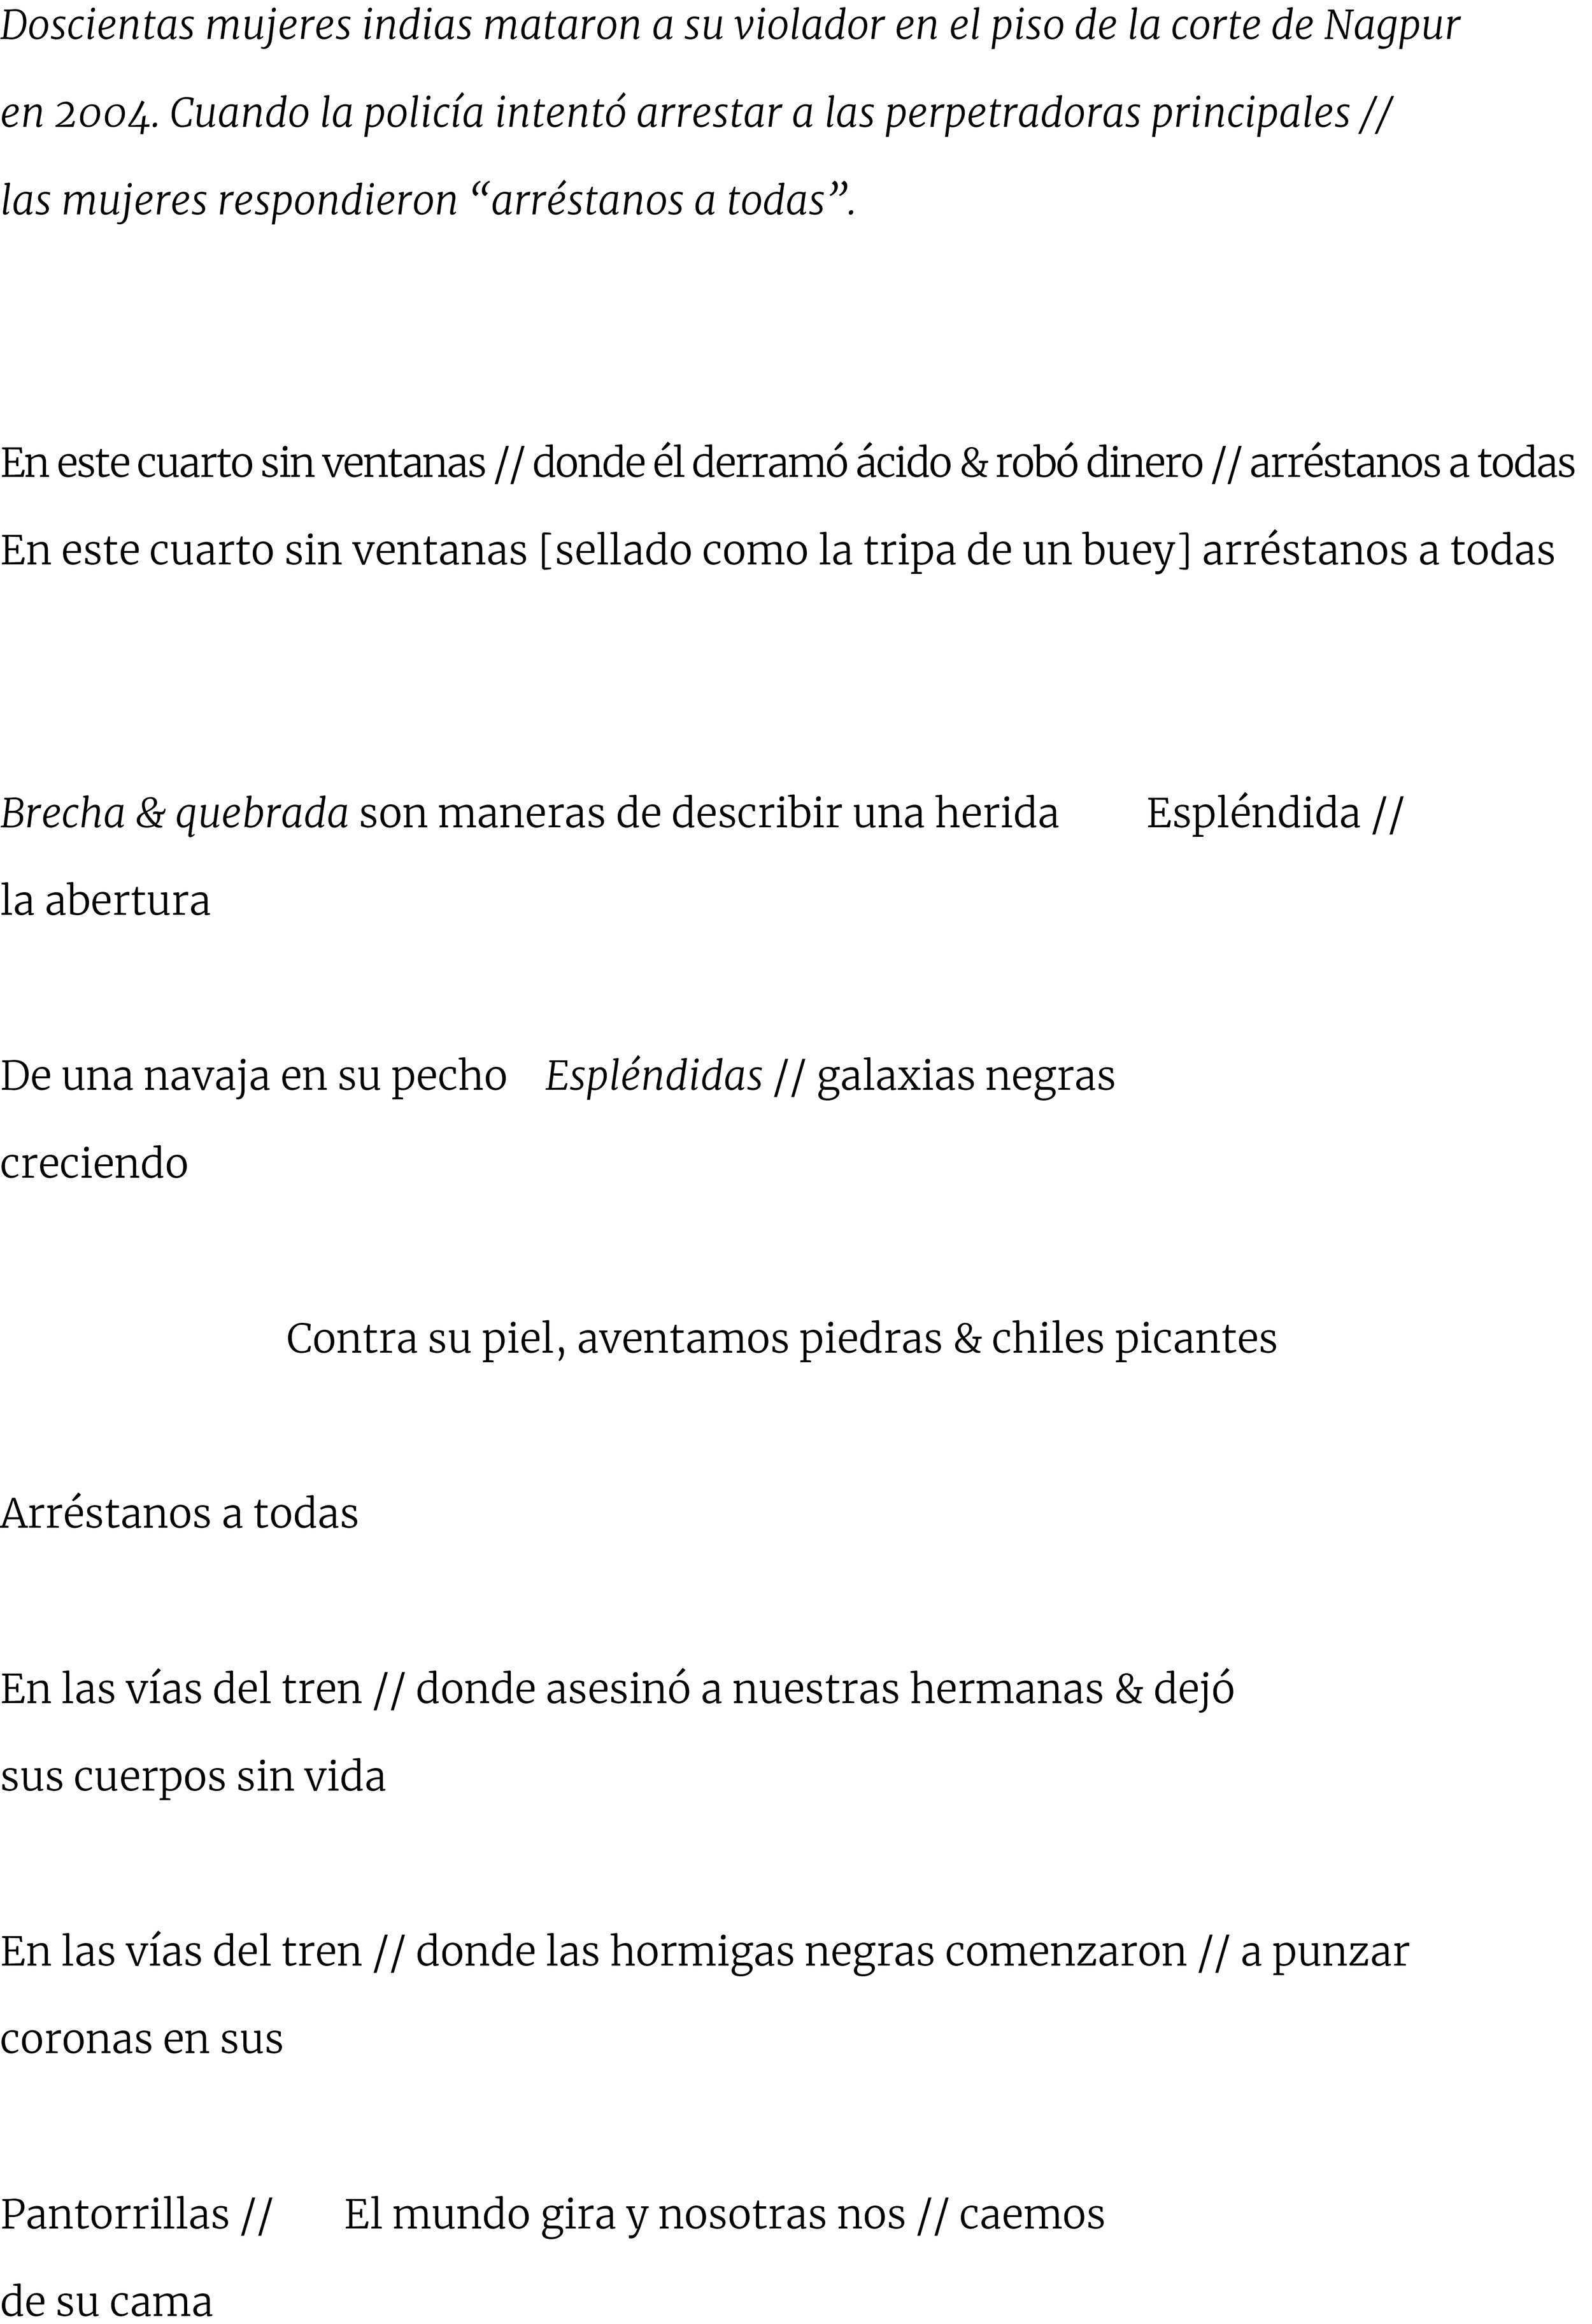 ES Christopher Soto4.png